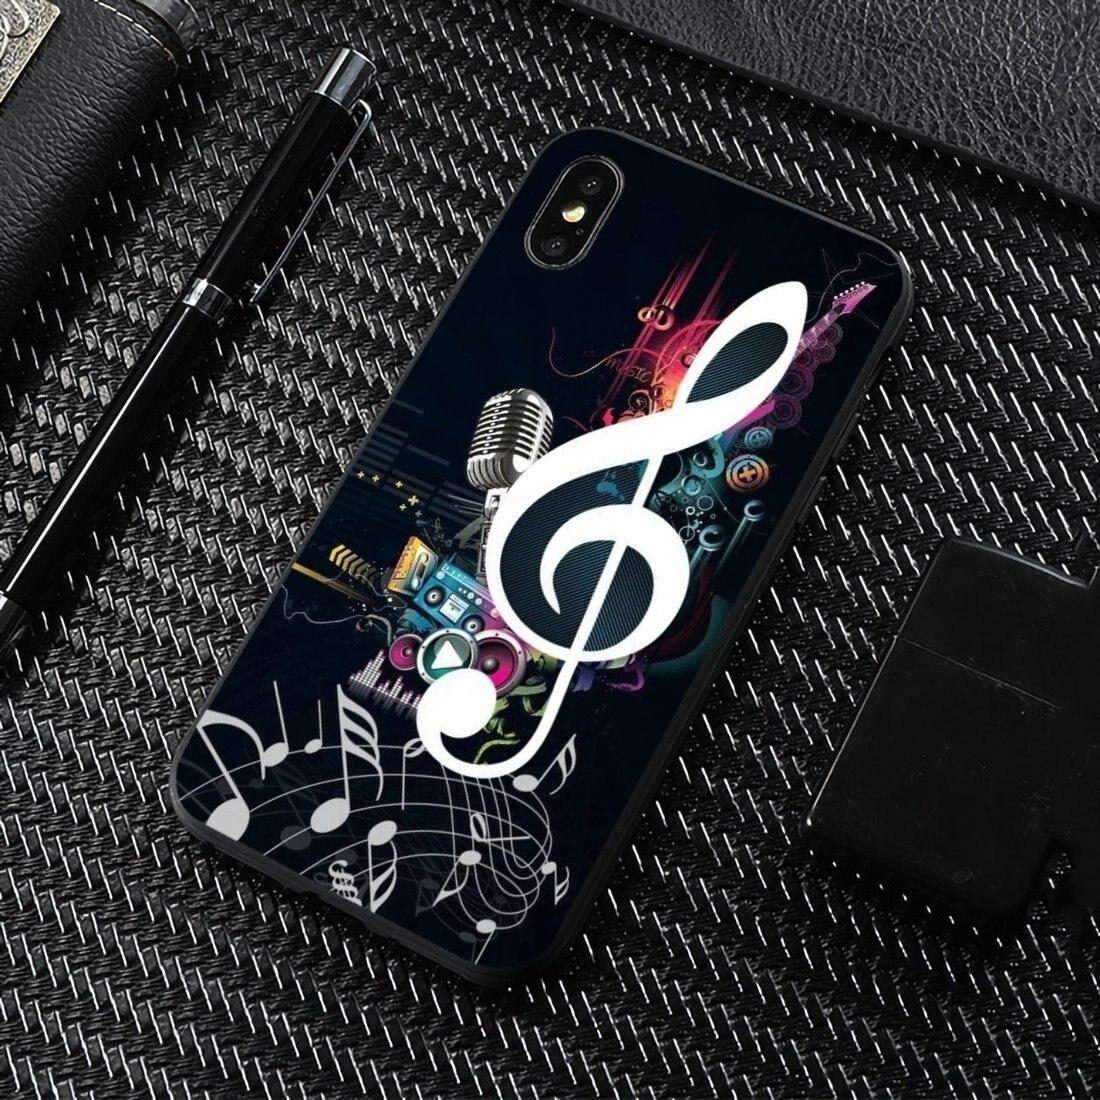 Para BQ Aquaris C U2 U V X2 X Lite Pro Plus E4.5 M4.5 X5 E5 4G M 2017 moderna línea de arte música nota logotipo de la caja de la piel del silicón